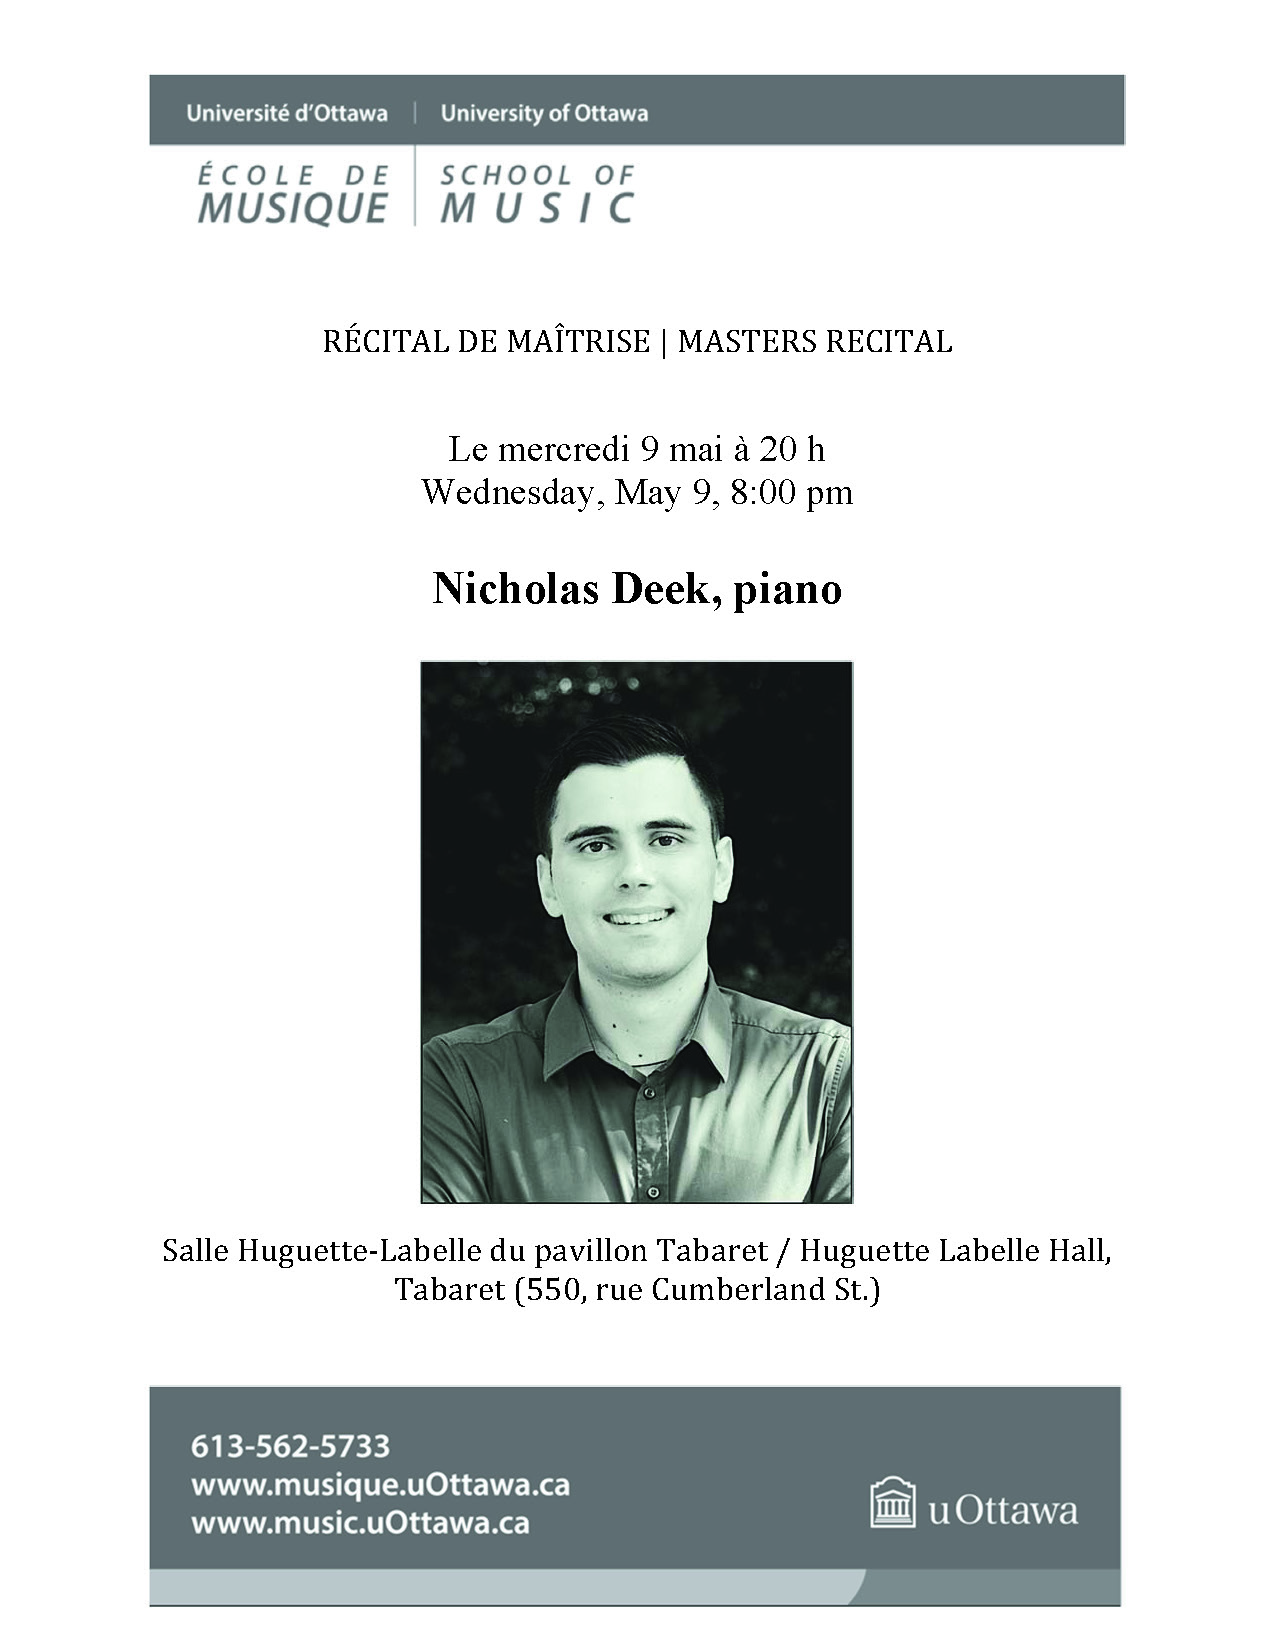 Page 1 of Nicolas Deek's recital program